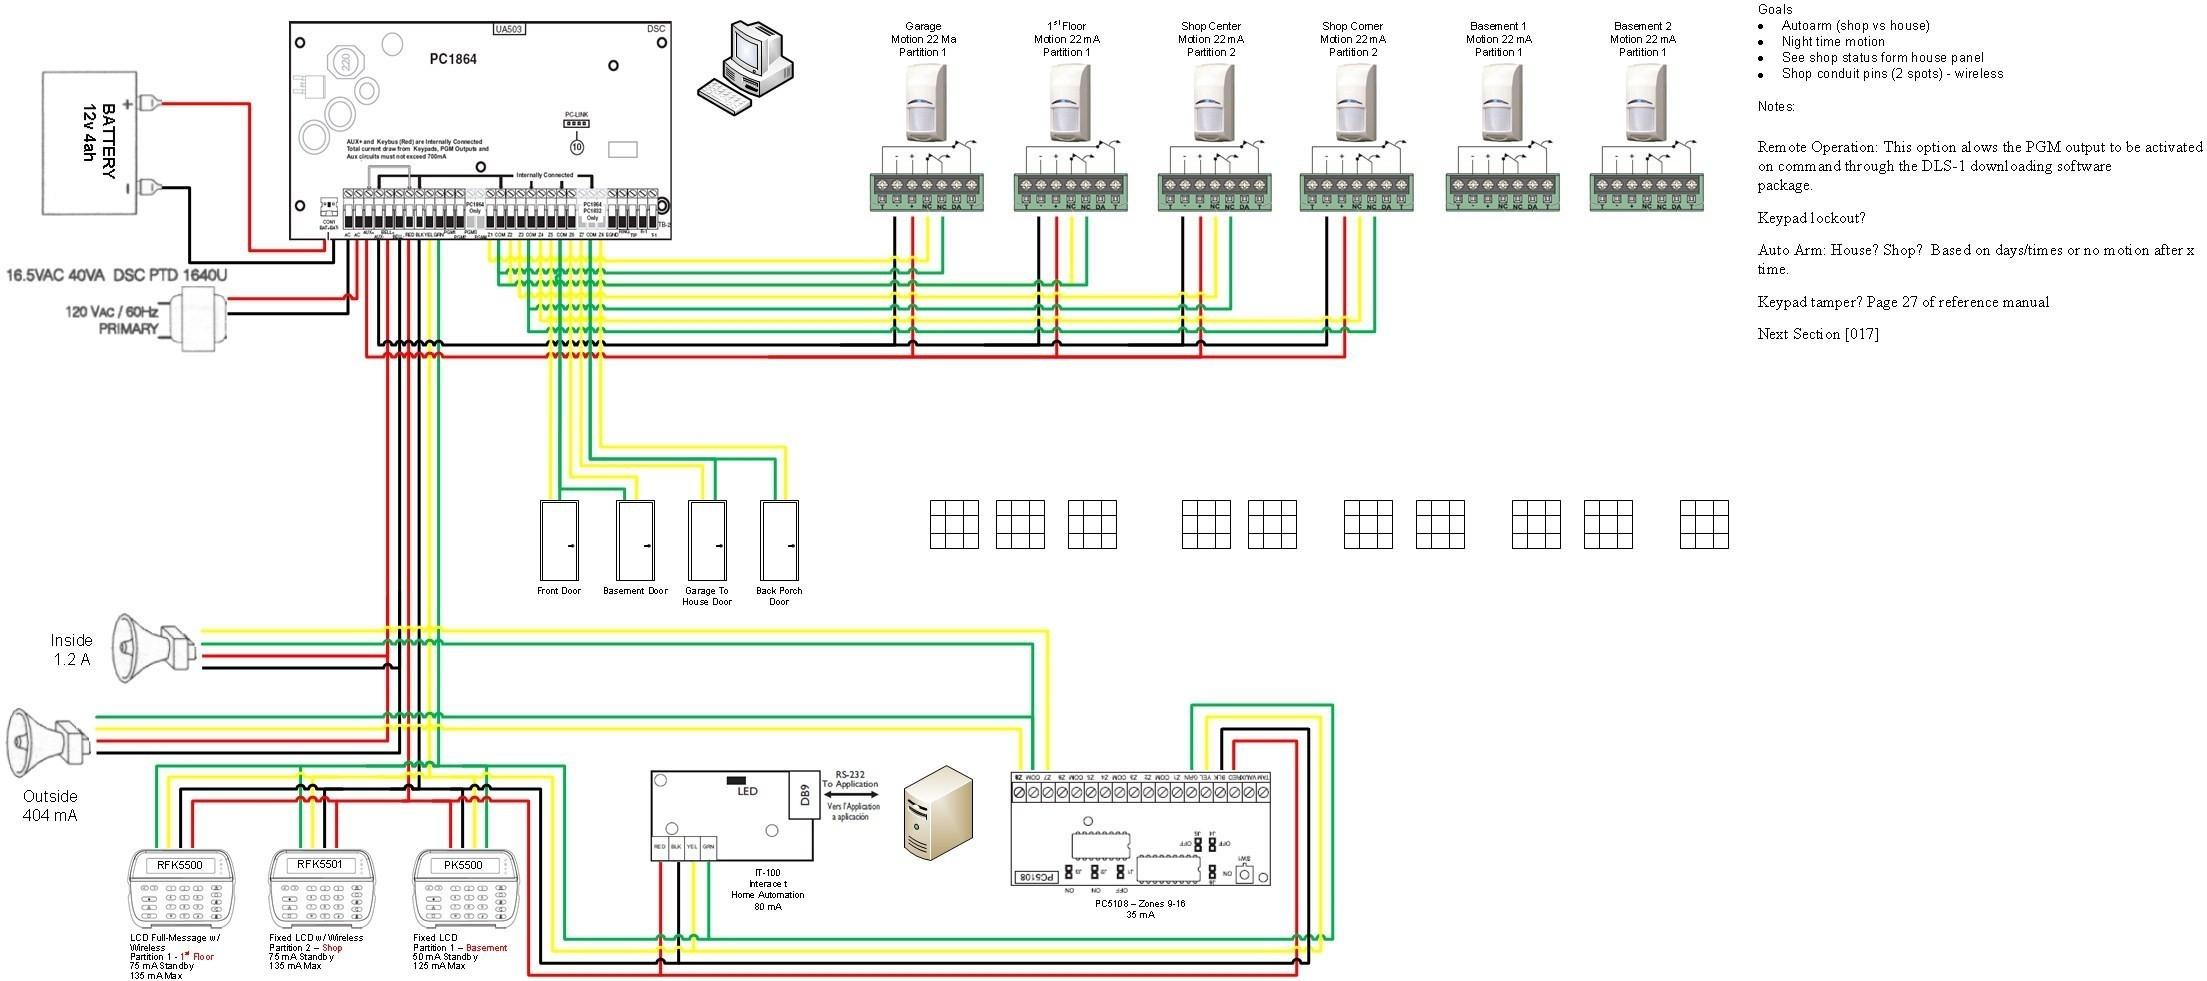 carvox alarm wiring diagram Collection-wire karr diagram alarm auto kpa2040a wire center u2022 rh boomerneur co 15-j